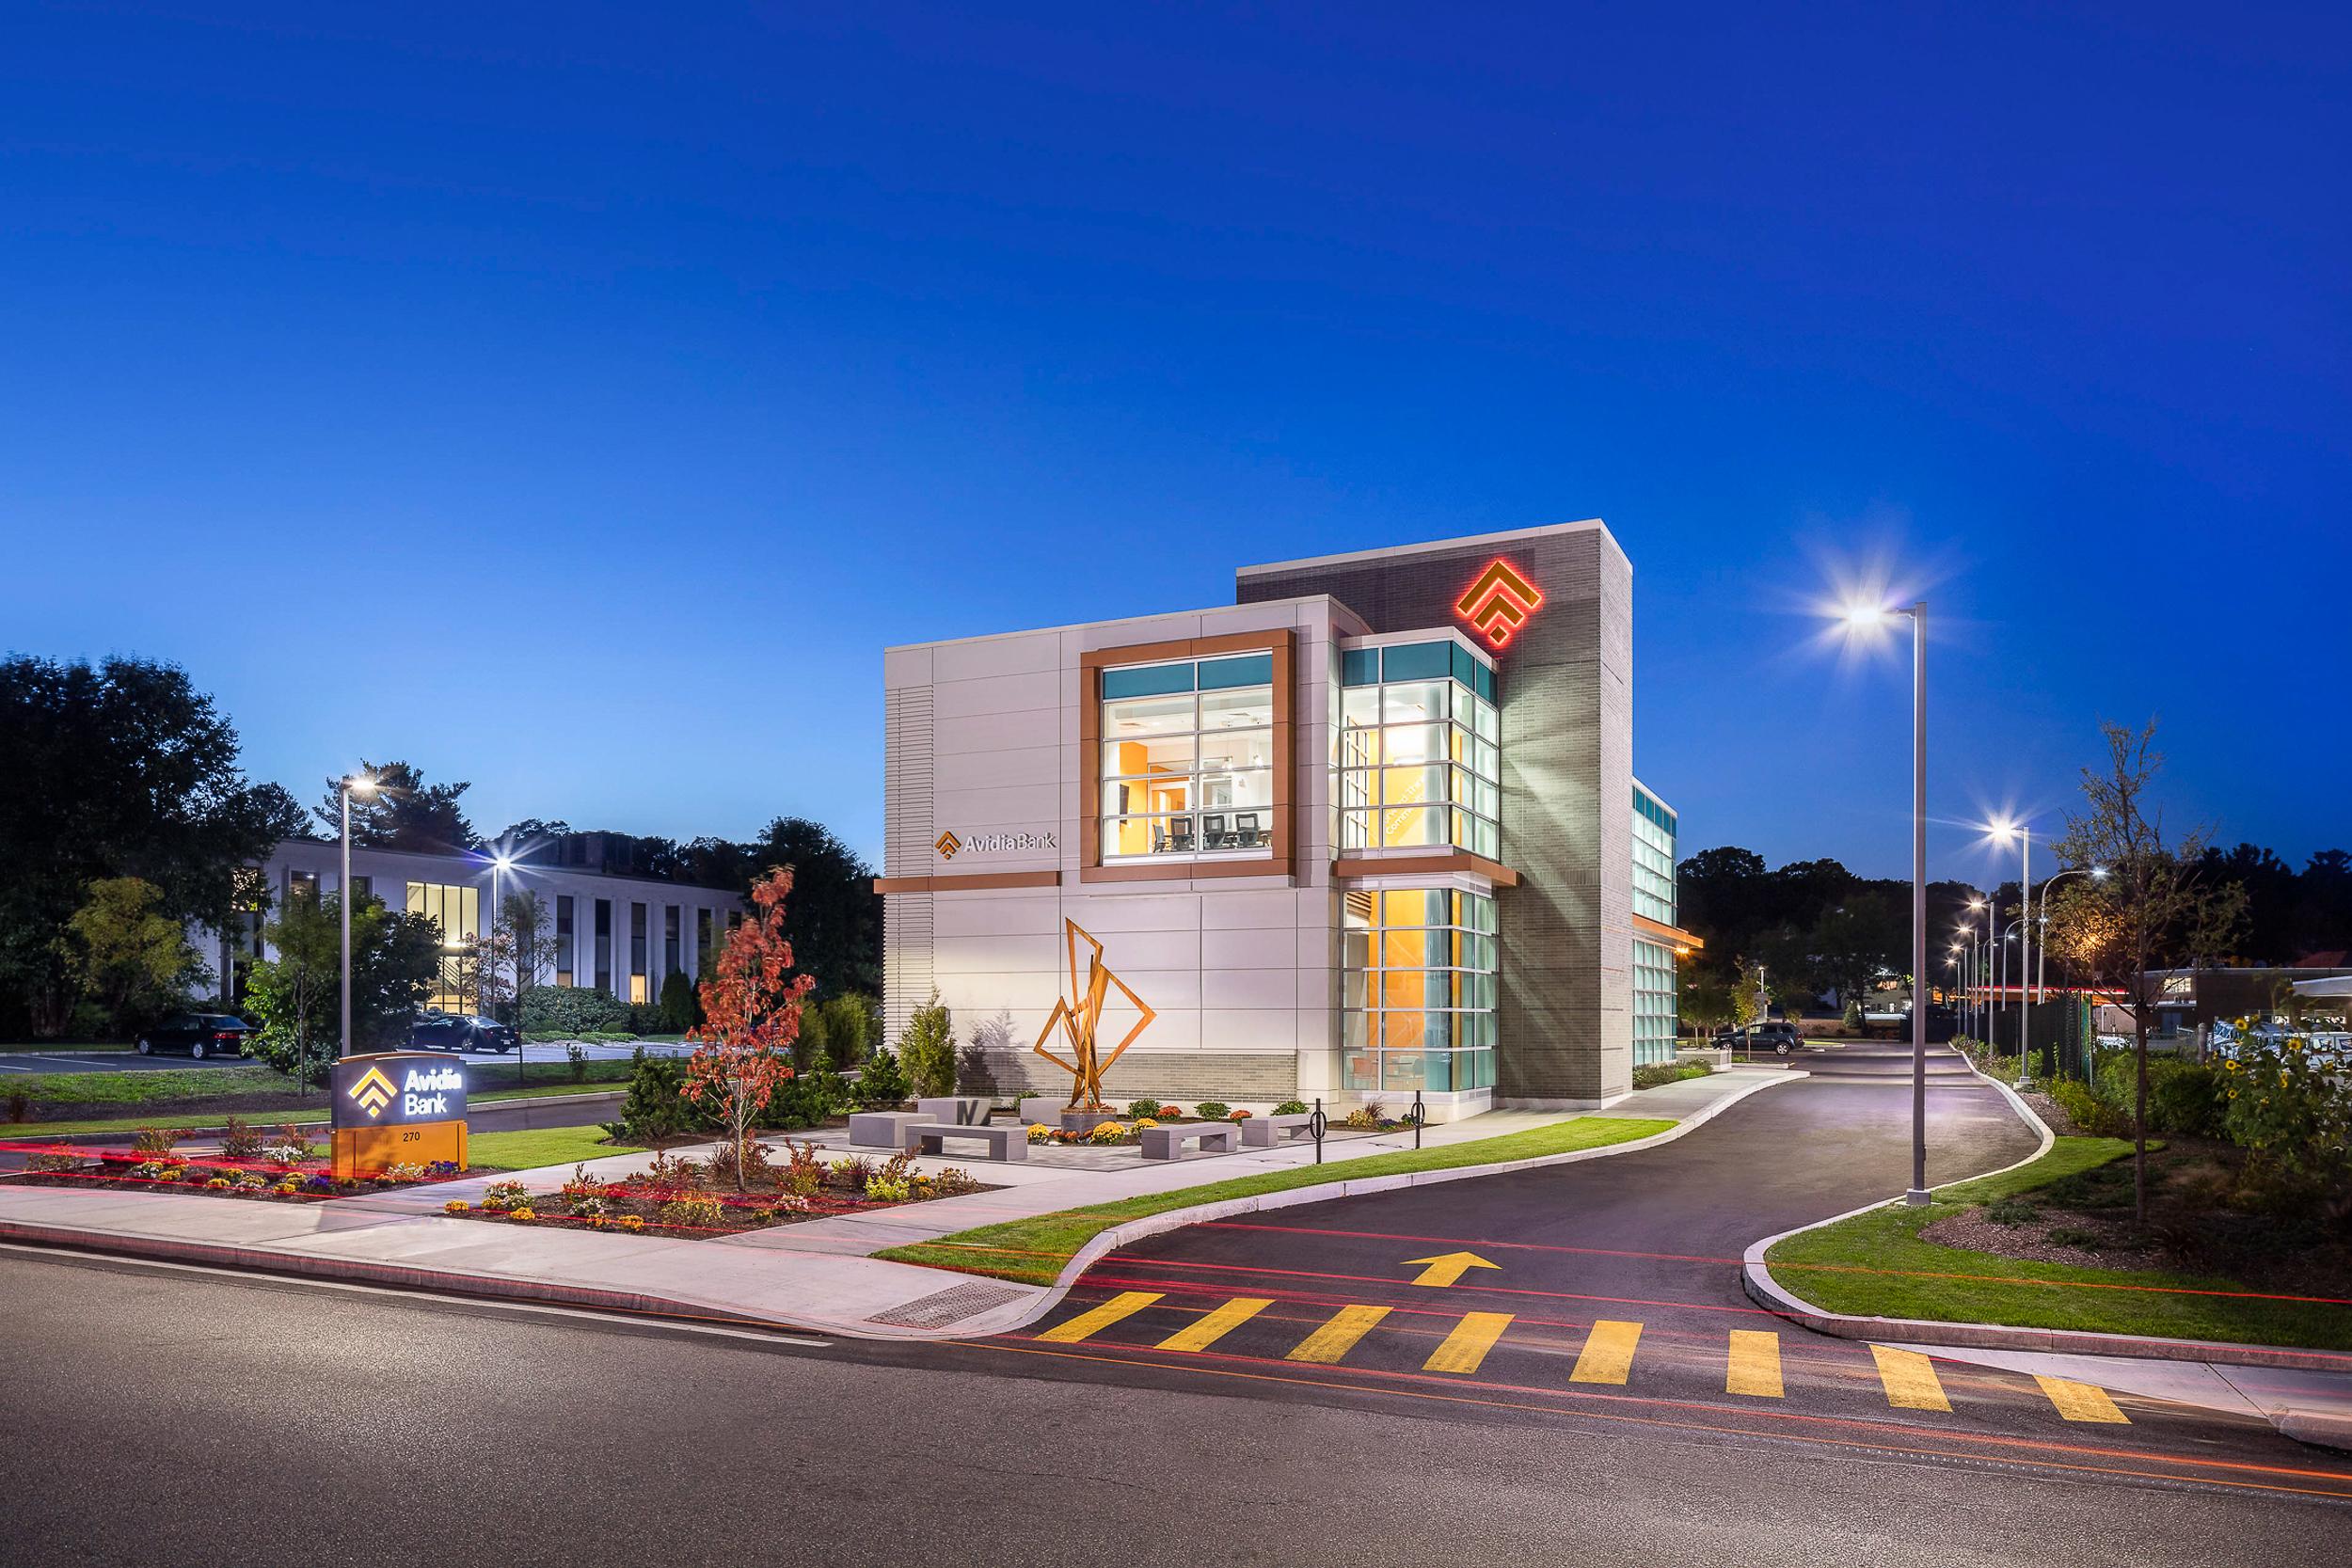 Avidia Bank at dusk Framingham MA, architectural design by Studio Q Architecture.